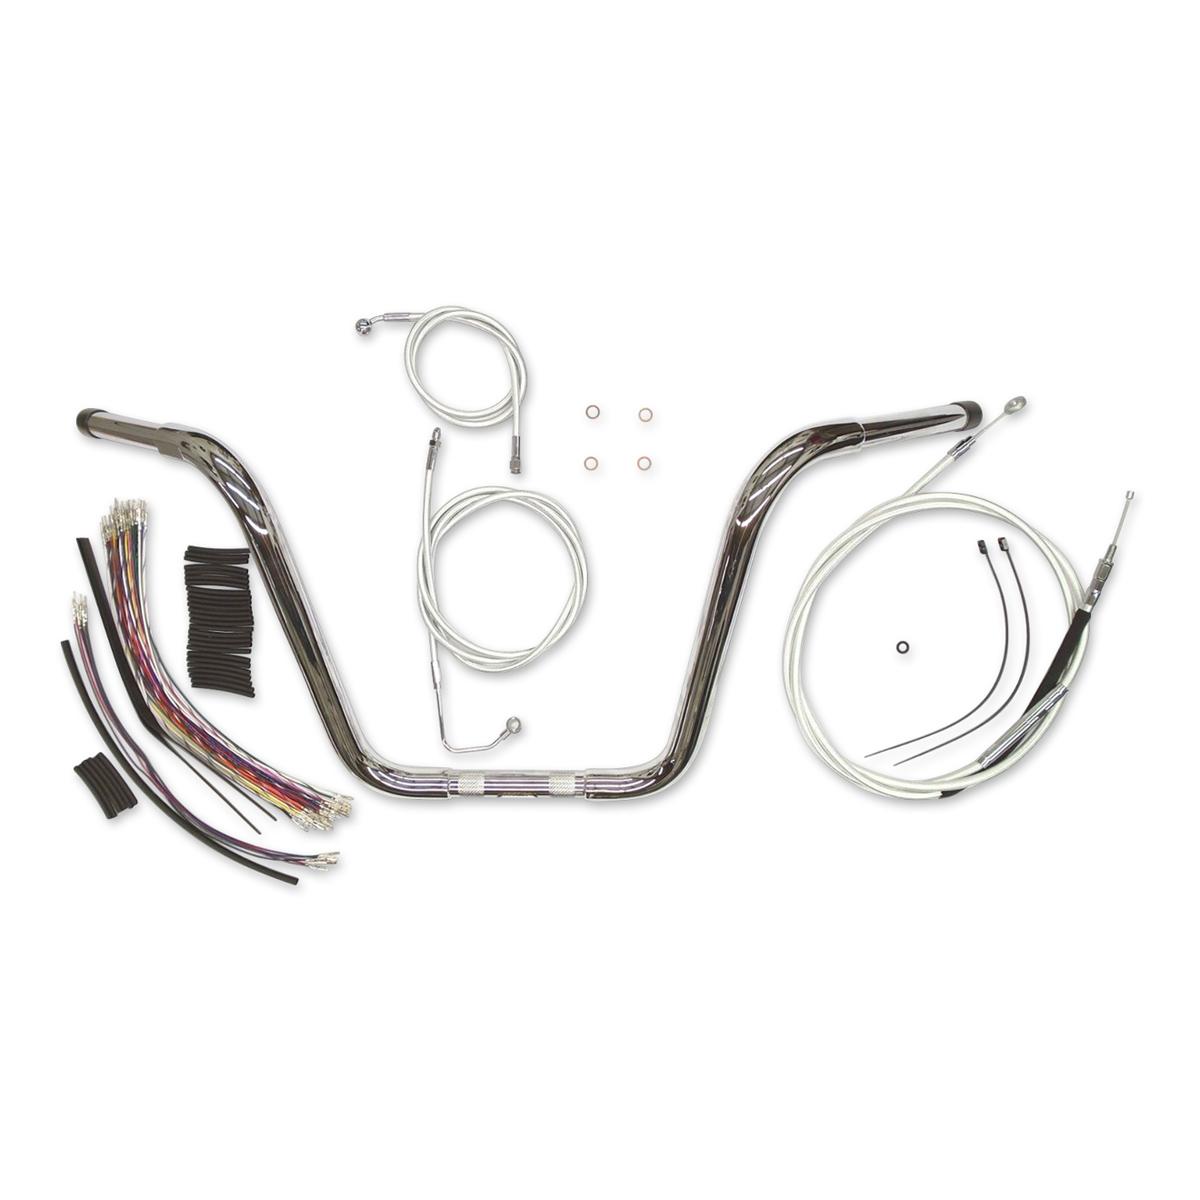 Magnum 1-1/4″ Chrome 16″ Caliber Ape Hanger With Install Kit